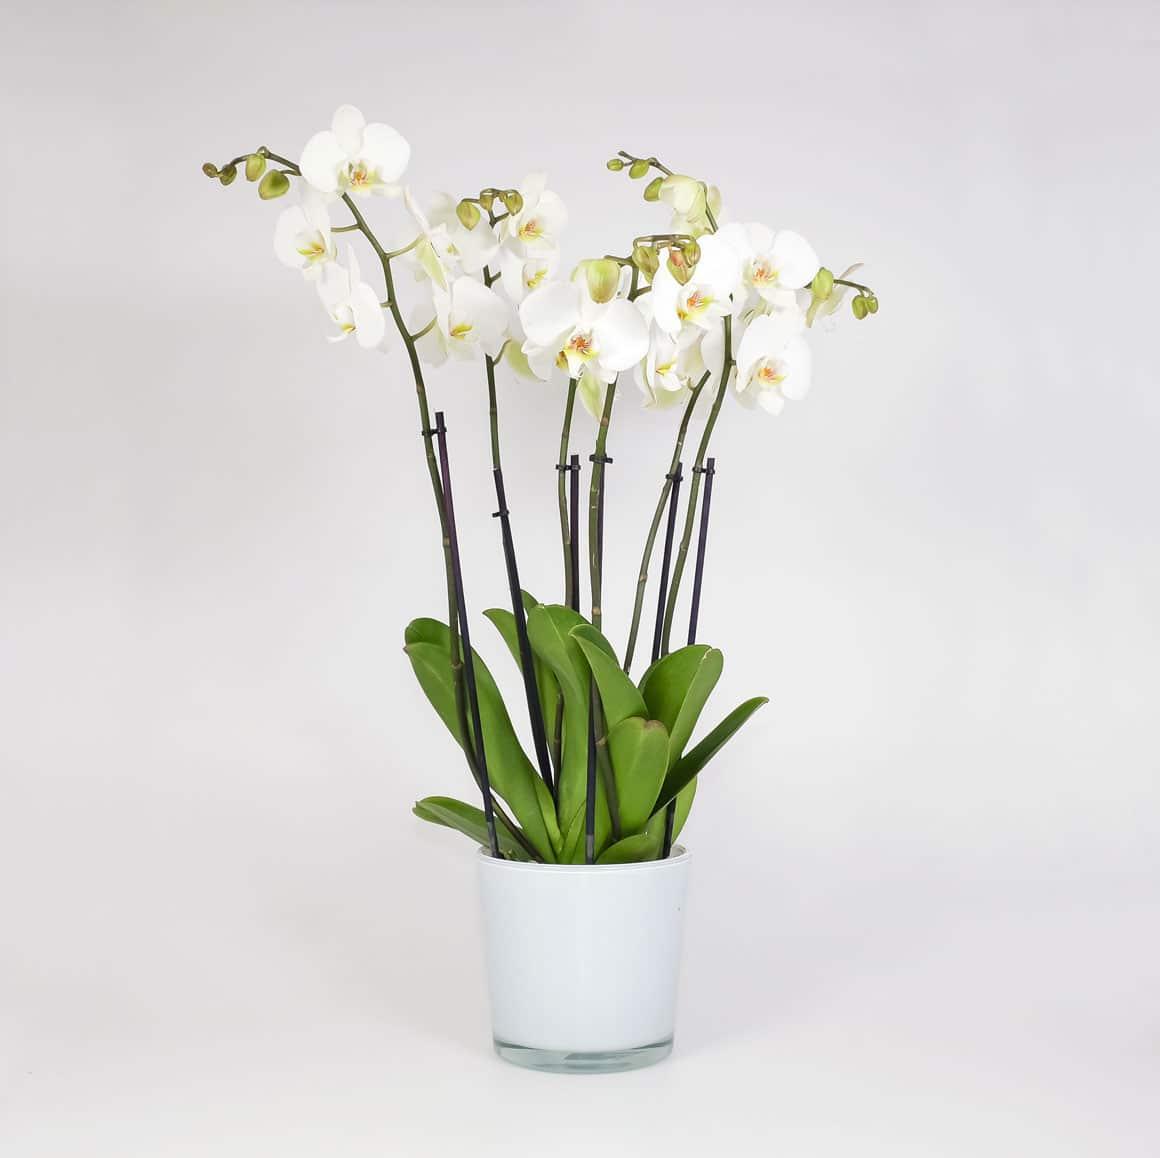 Pflanze Orchidee 5 Rispen